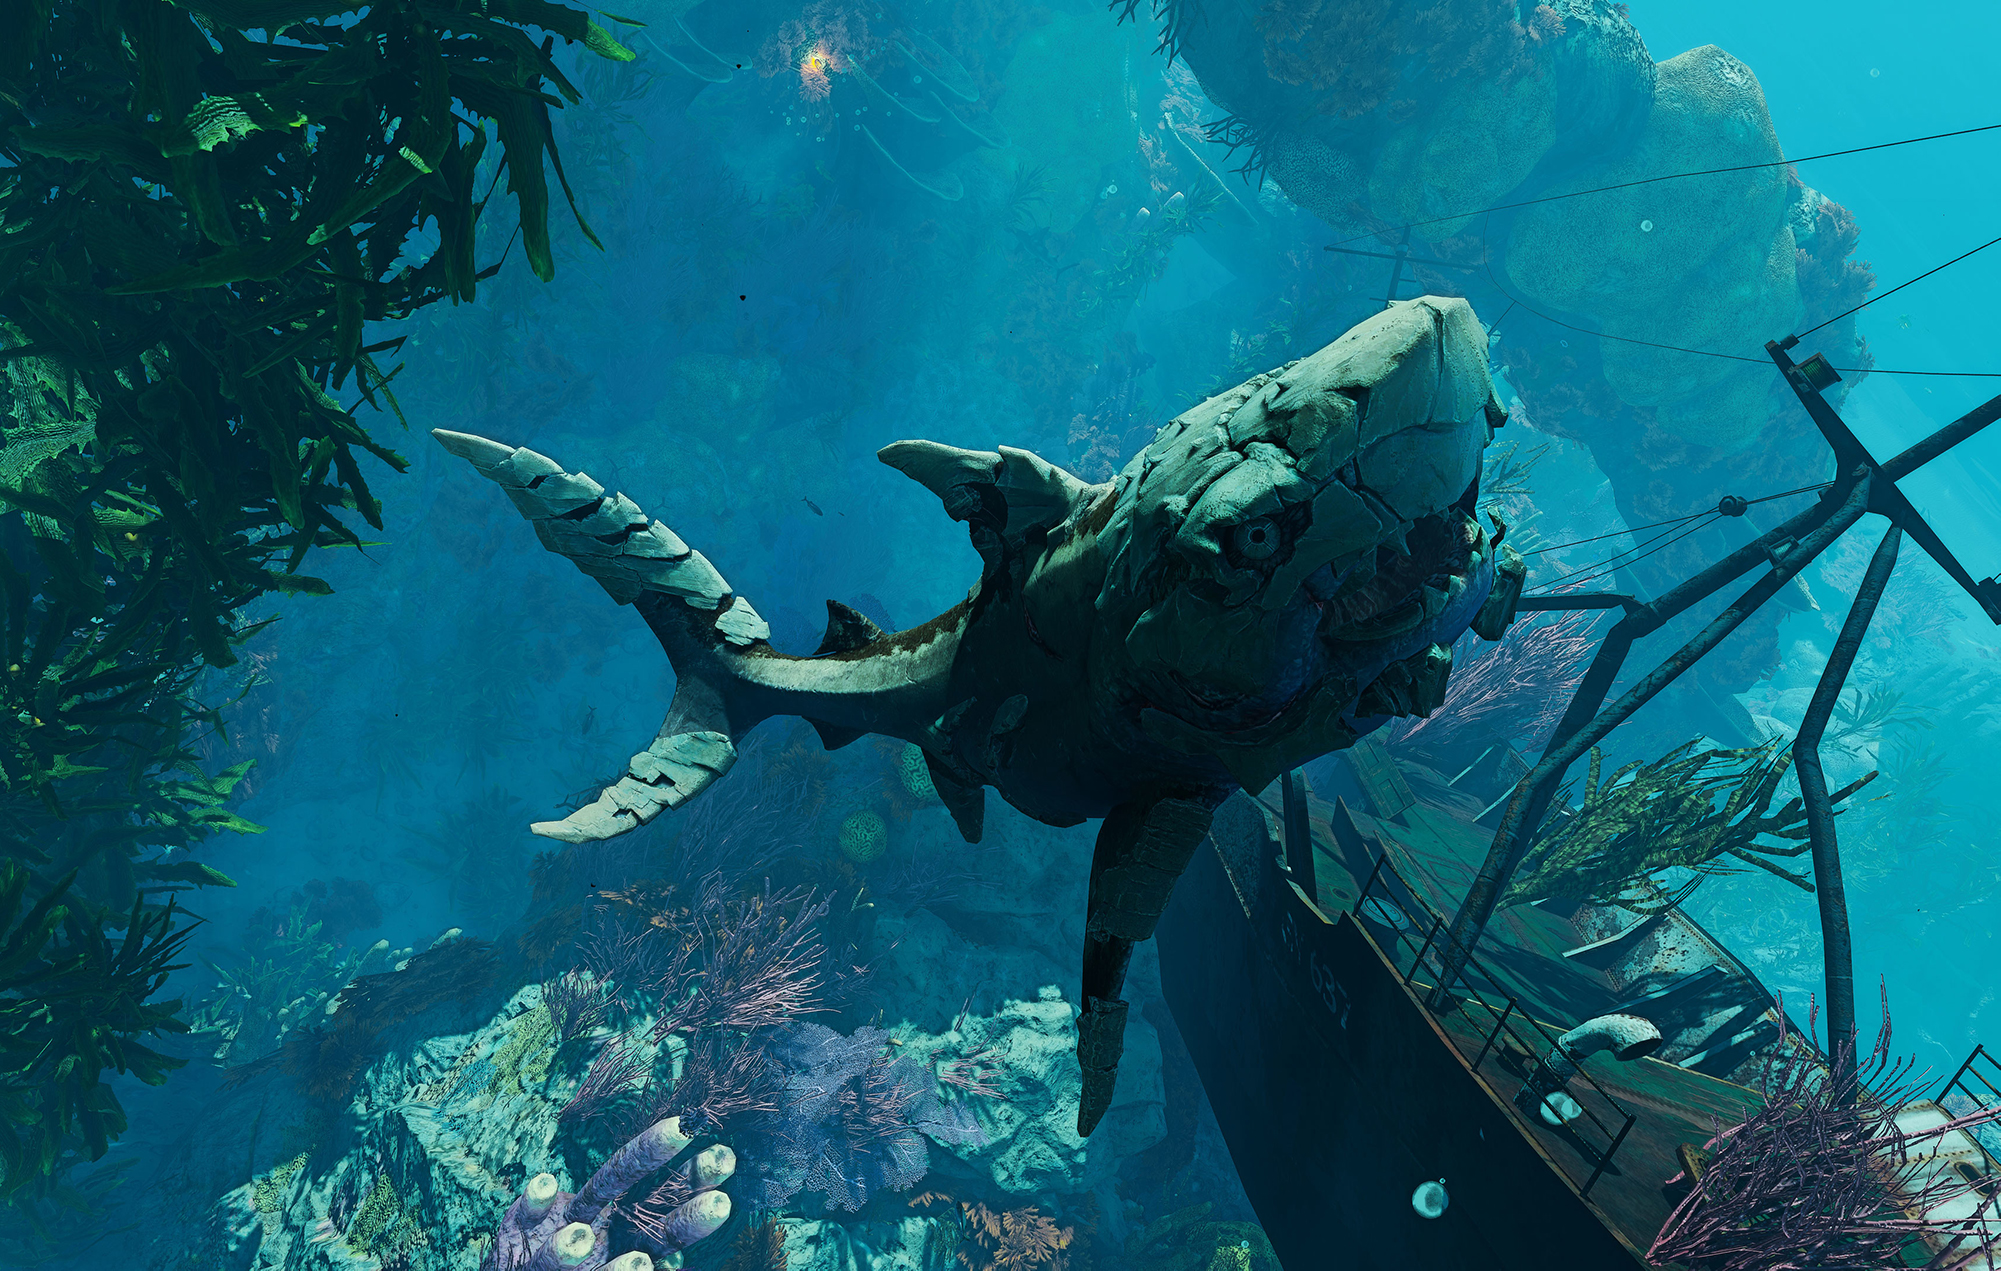 maneater stone shark